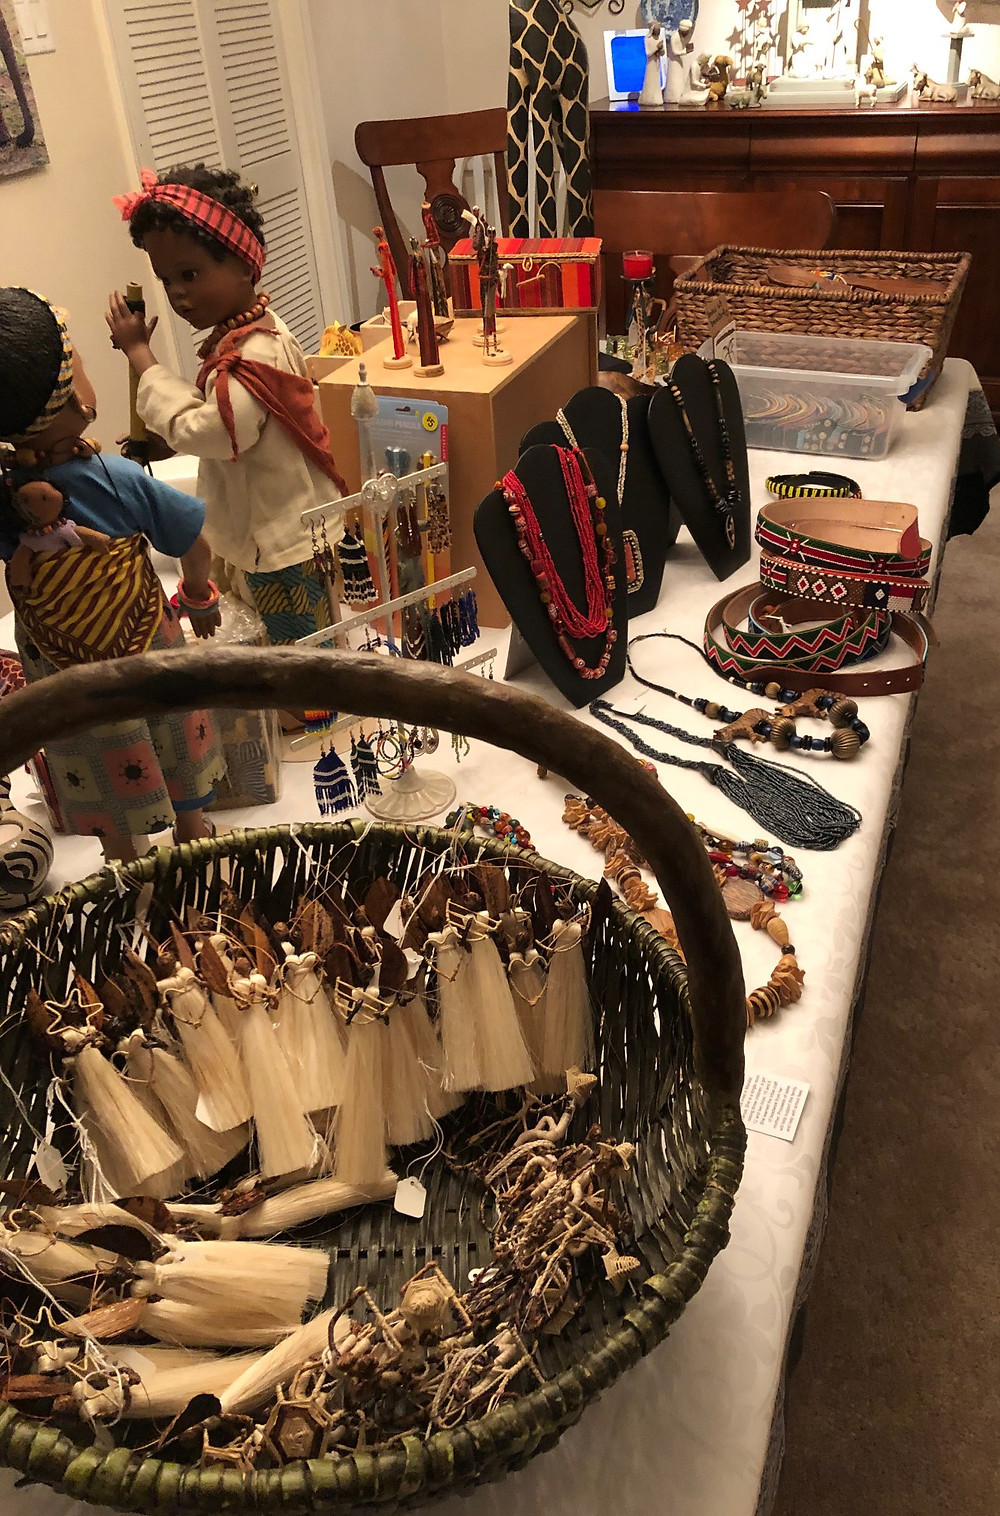 Handmade crafts from Kenya